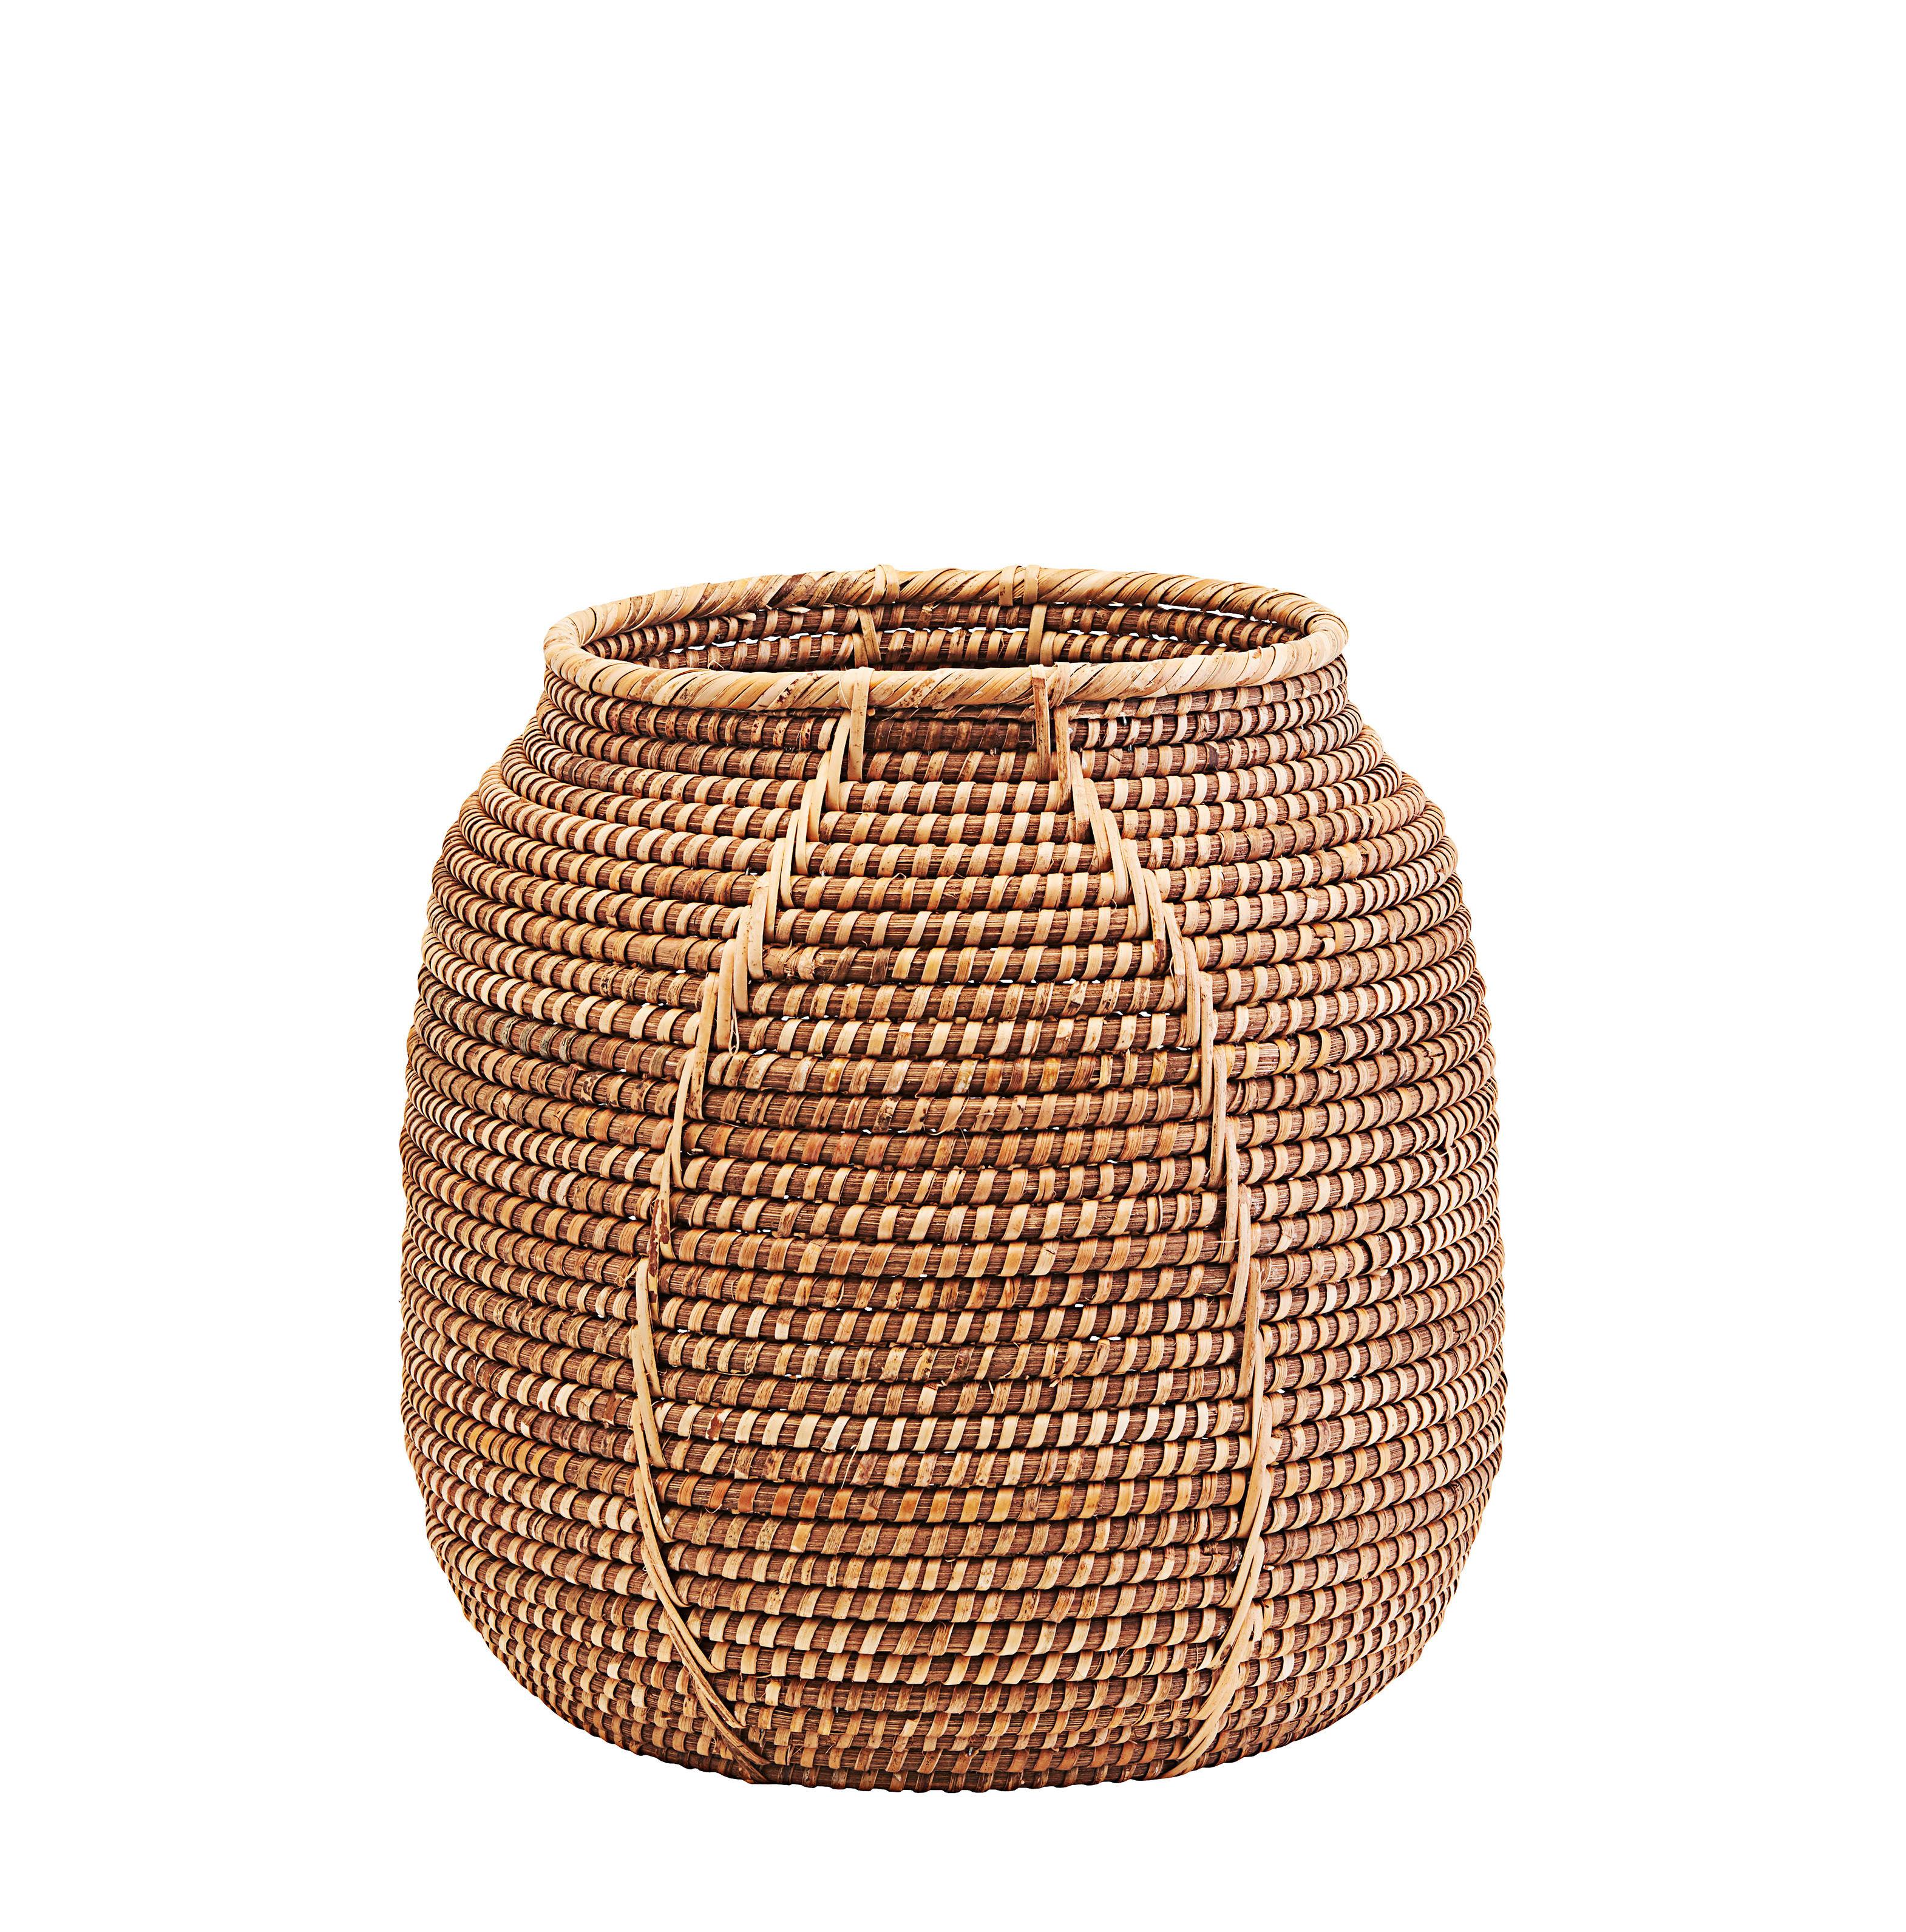 Decoration - Boxes & Baskets - Azeema Basket - / Rattan - Ø 38 x H 37 cm by House Doctor - Ø 38 x H 37 cm / Rattan - Rattan